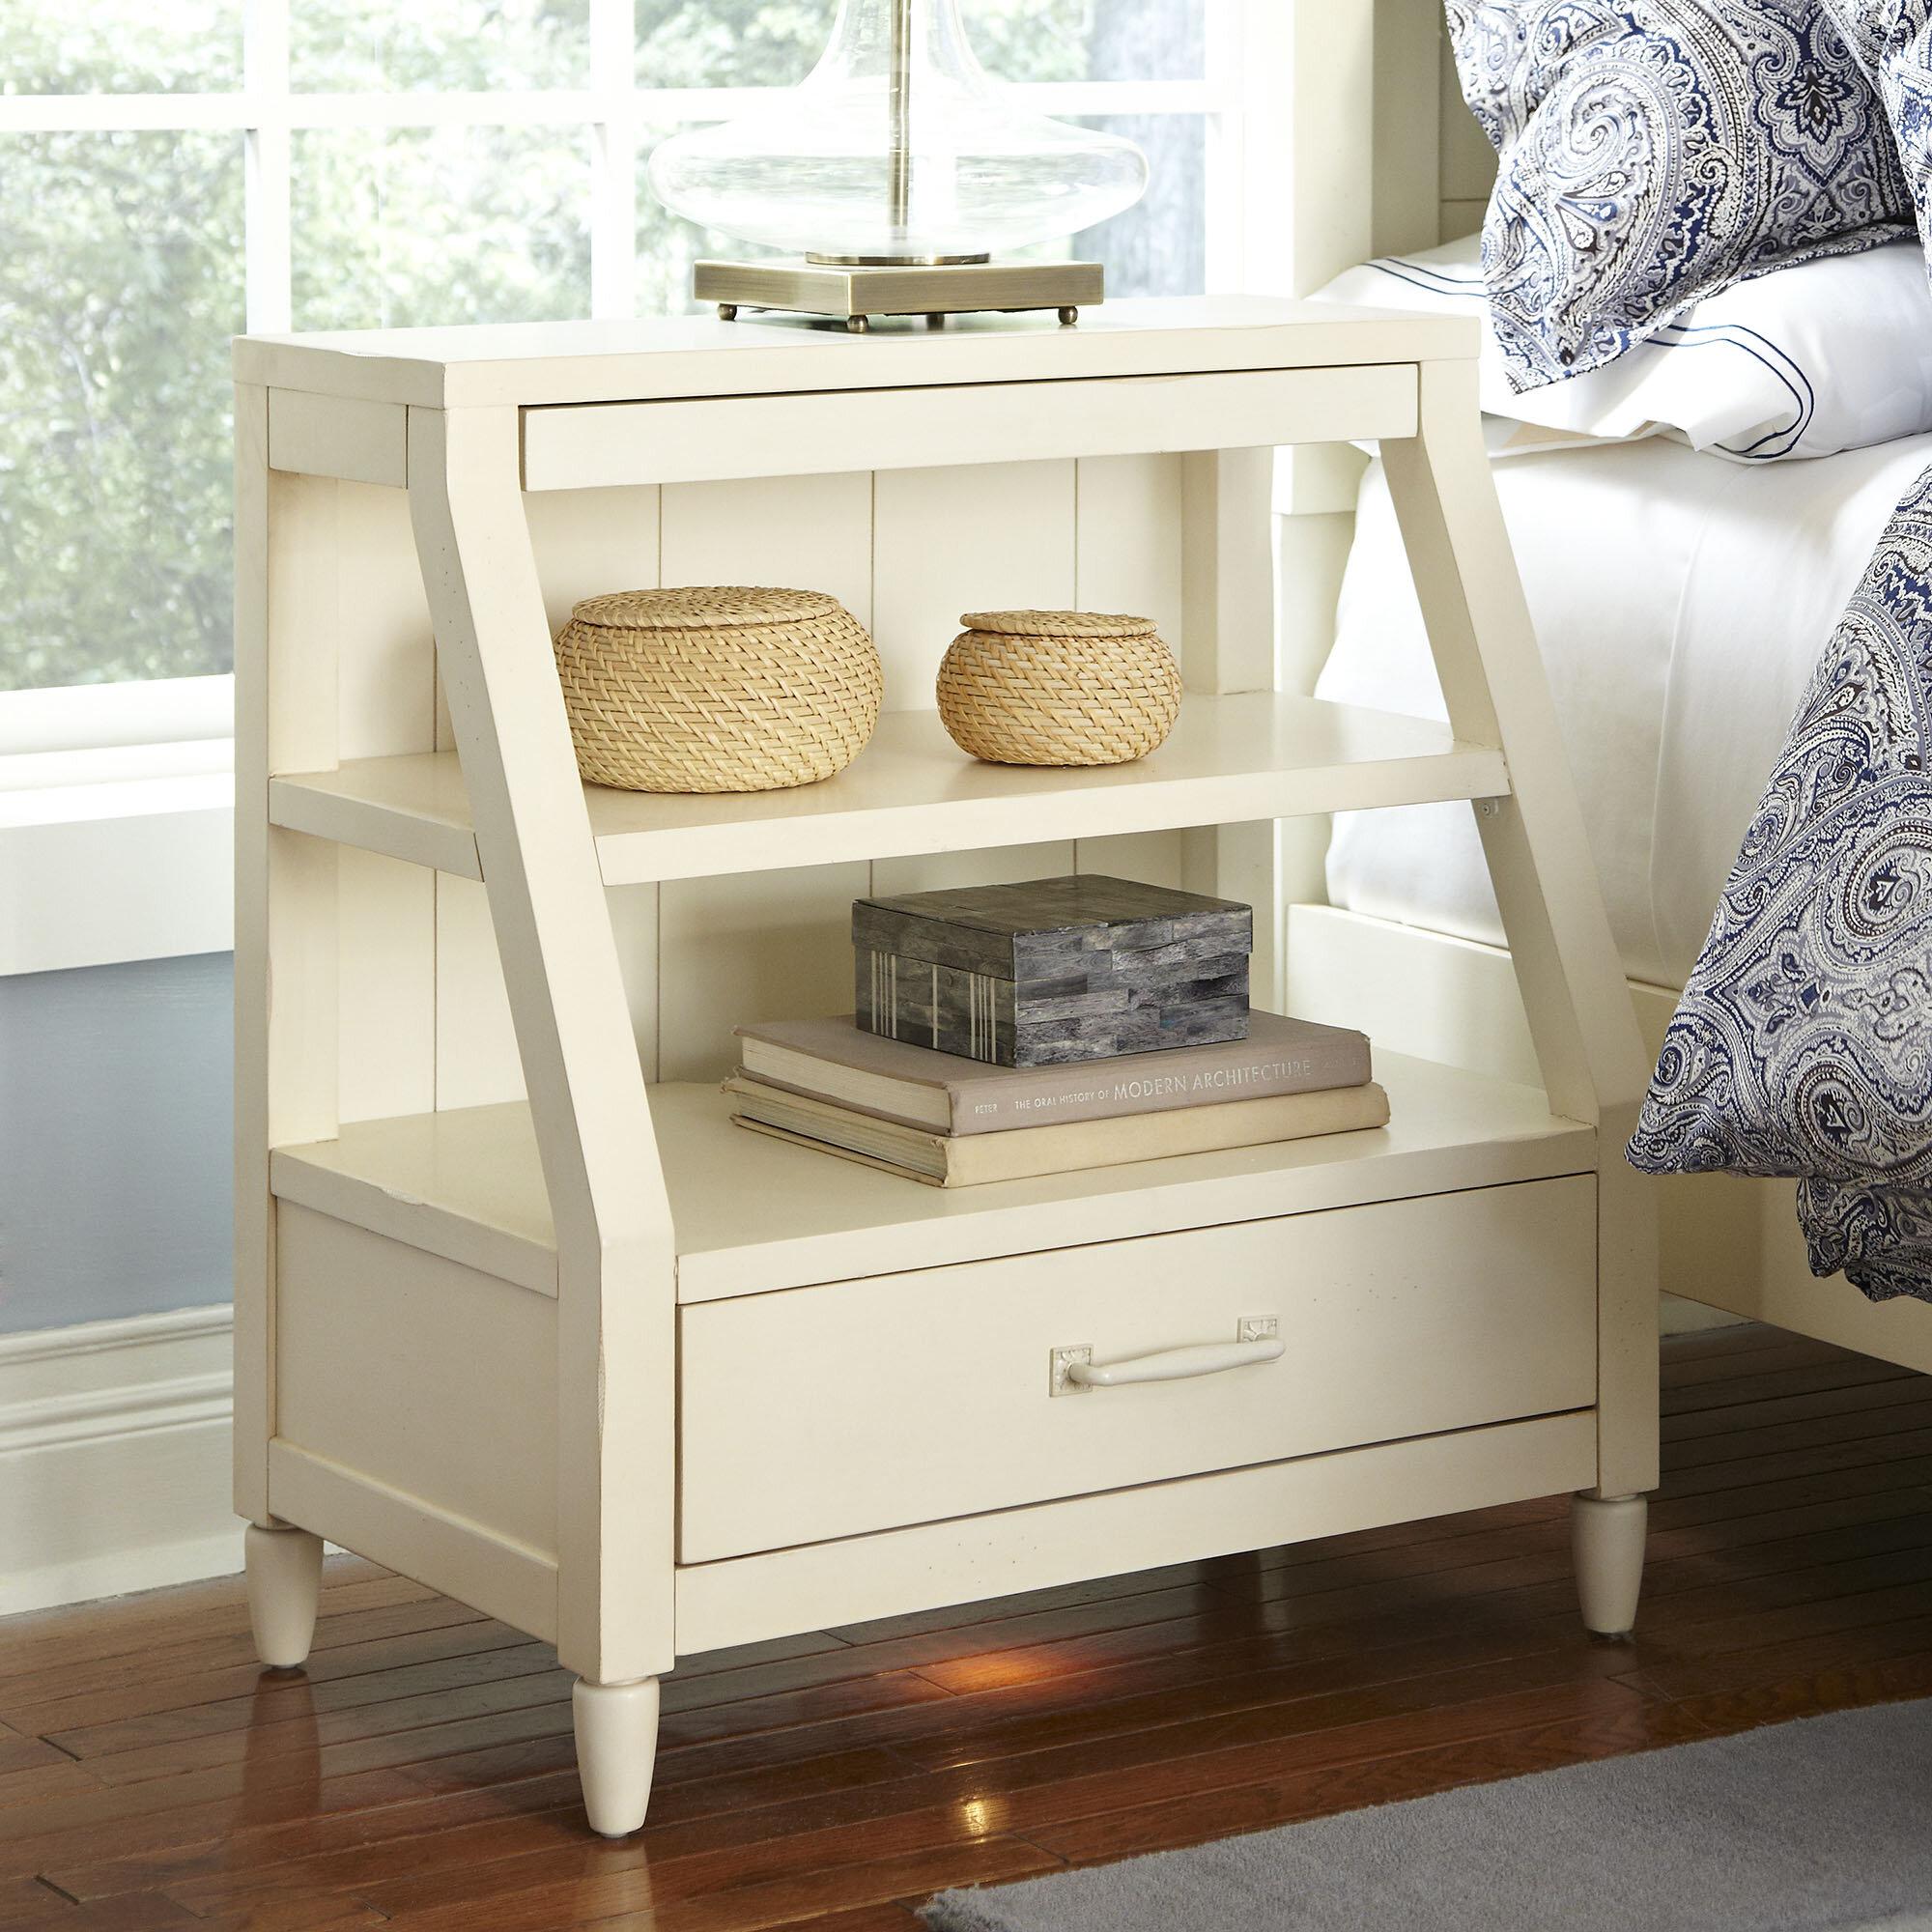 Birch LaneTM Heritage Reeves Open Shelf 1 Drawer Nightstand Reviews